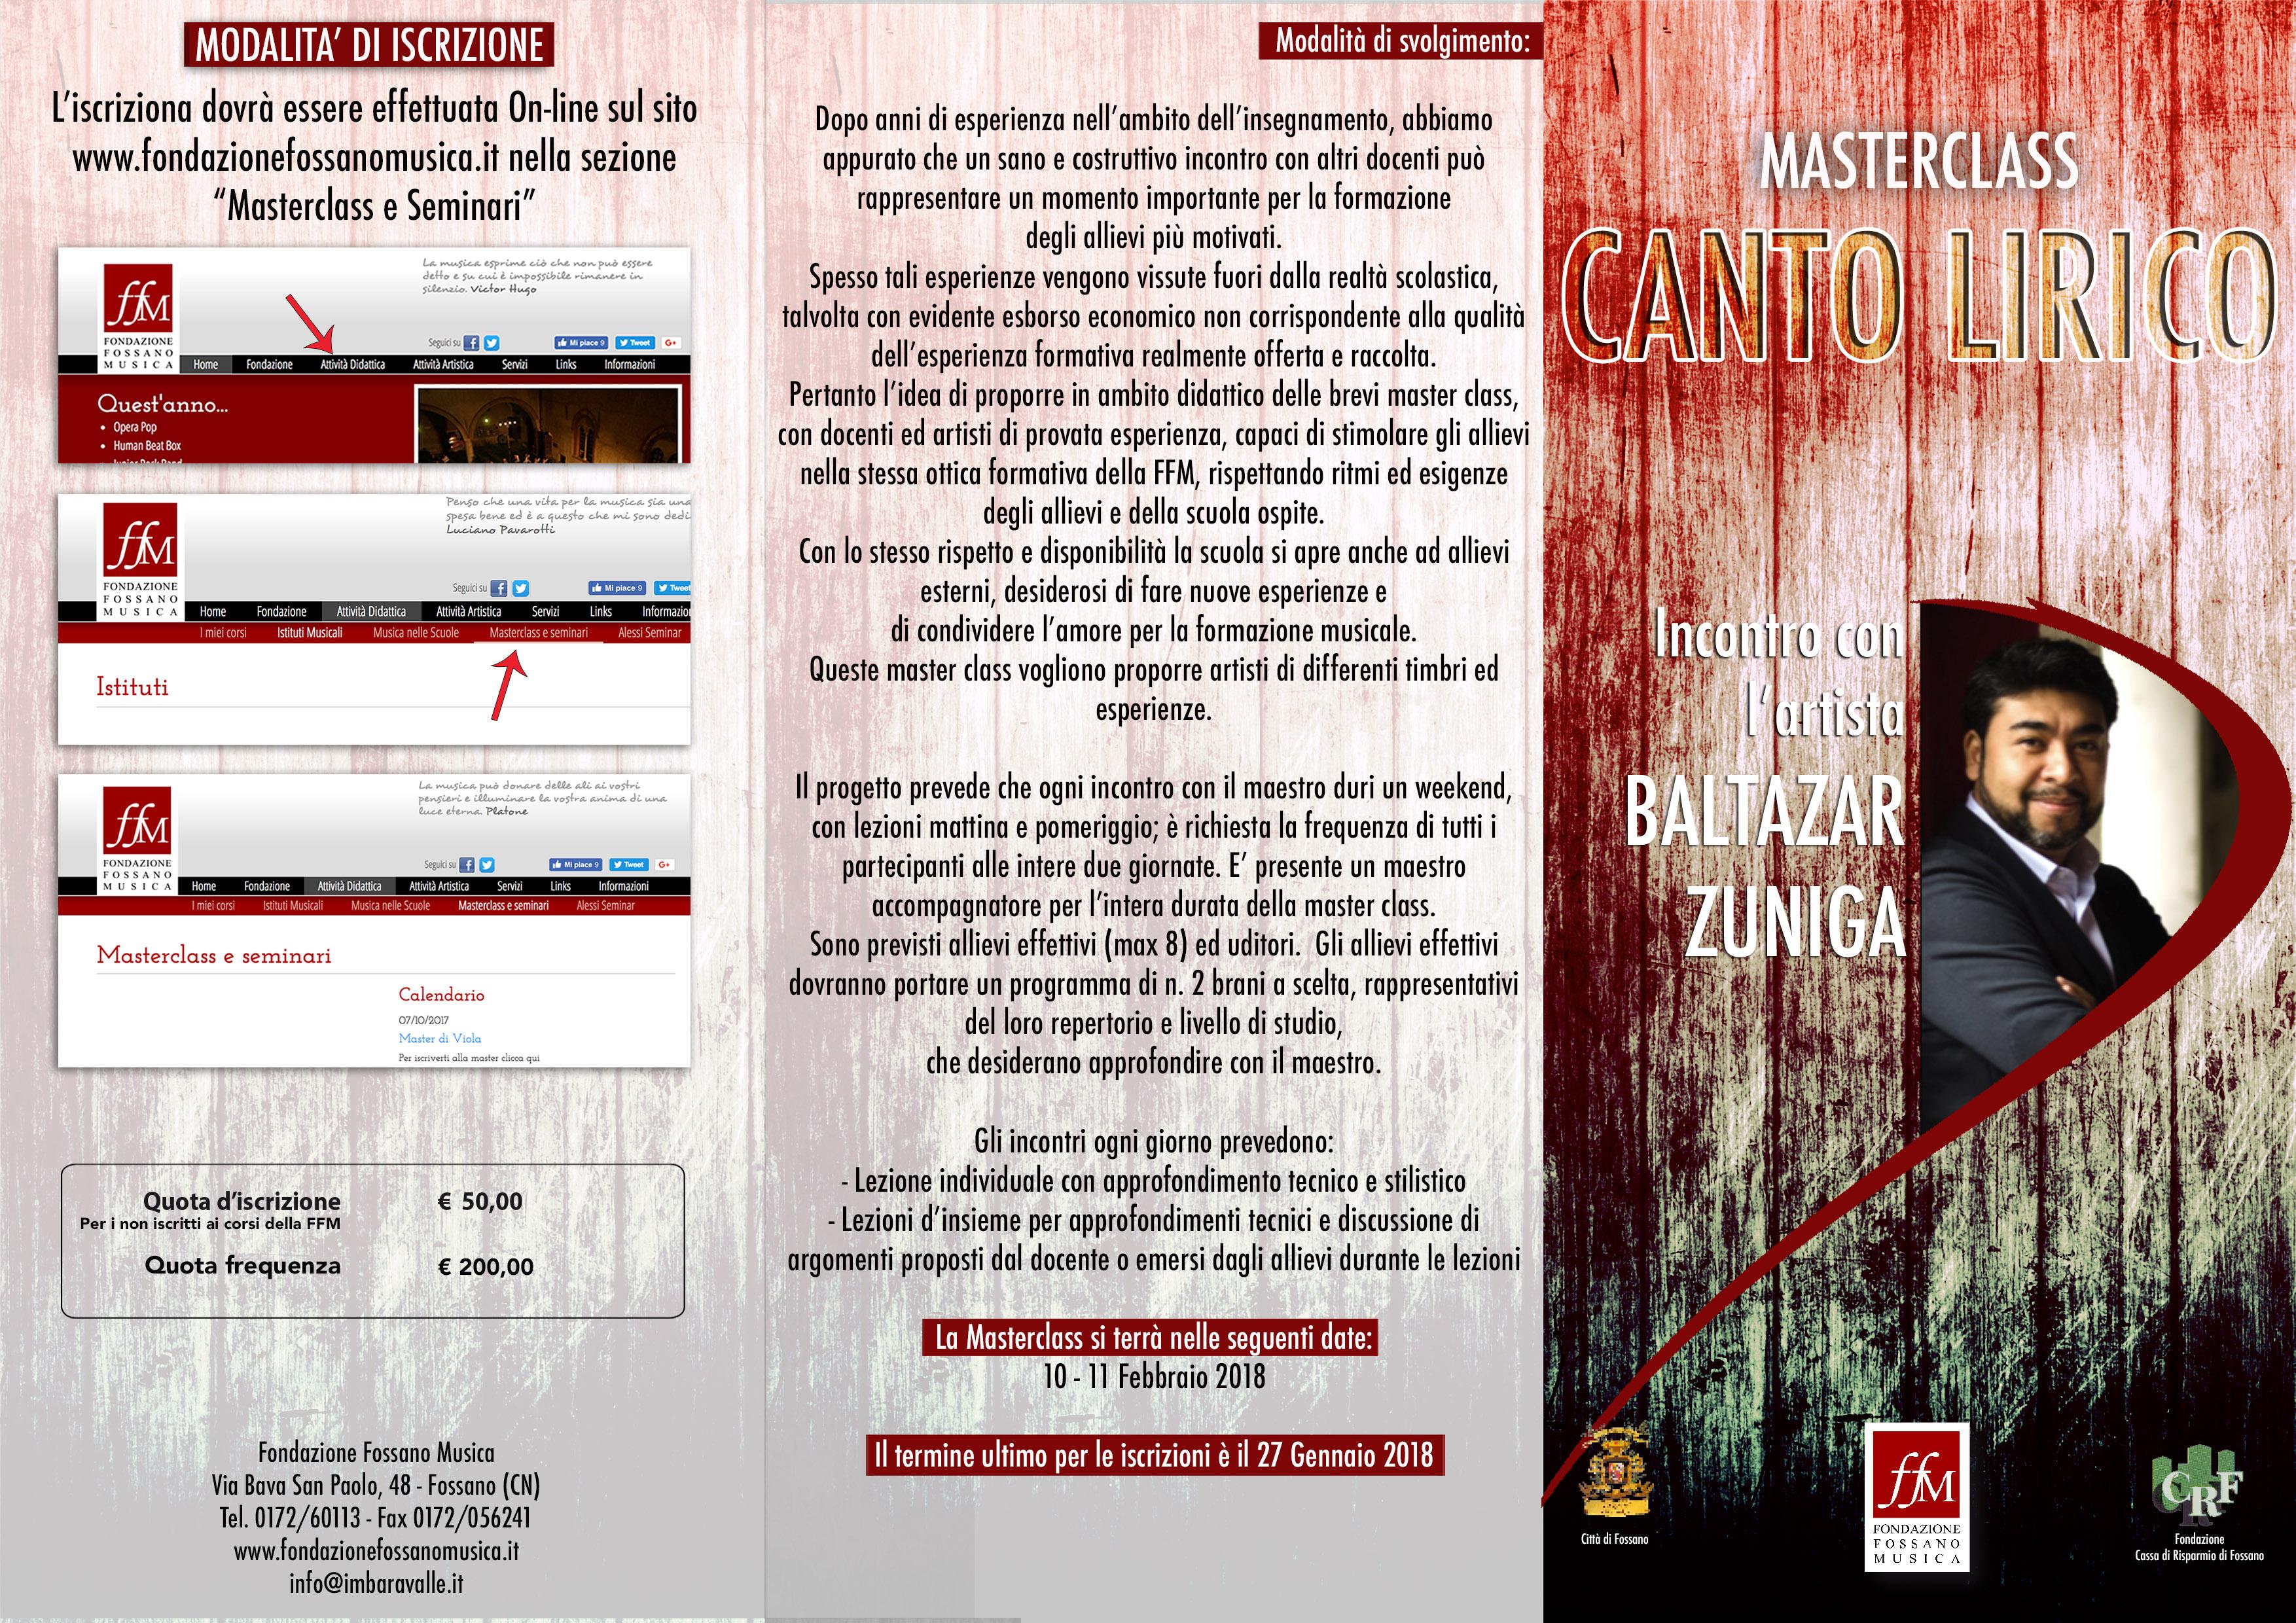 Brochure Masterclass Zuniga Fronte